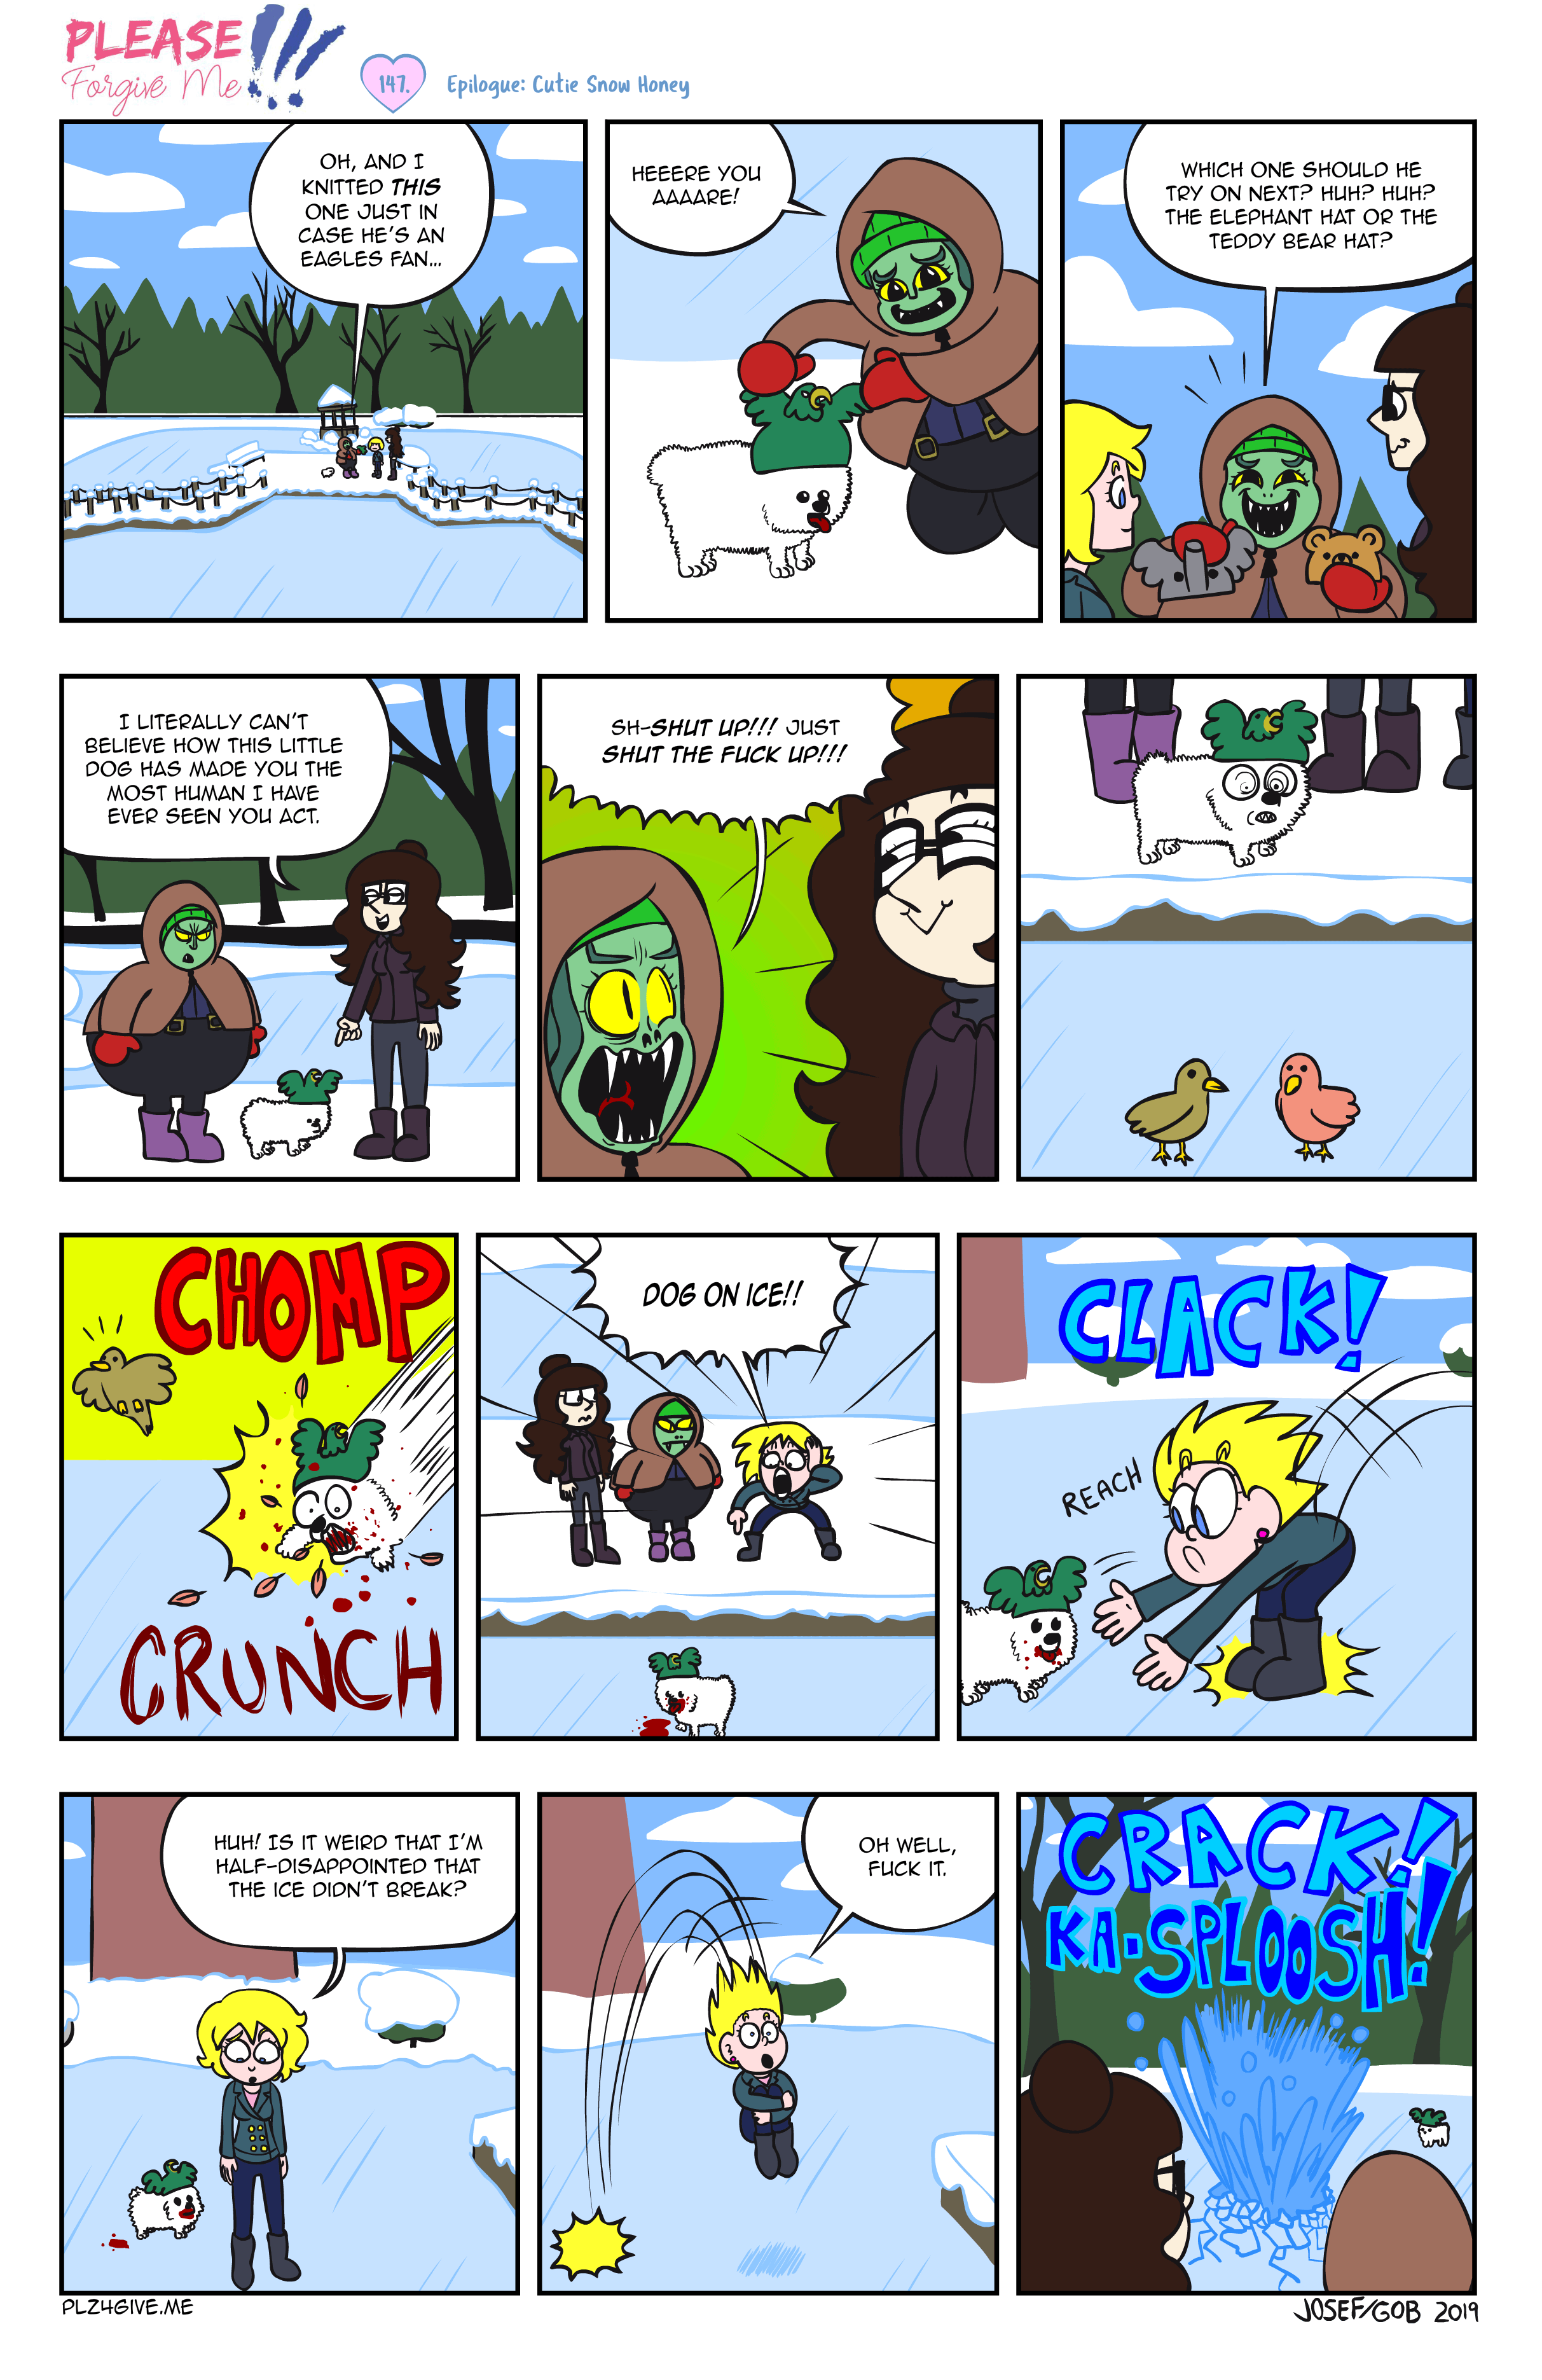 147: Epilogue: Cutie Snow Honey